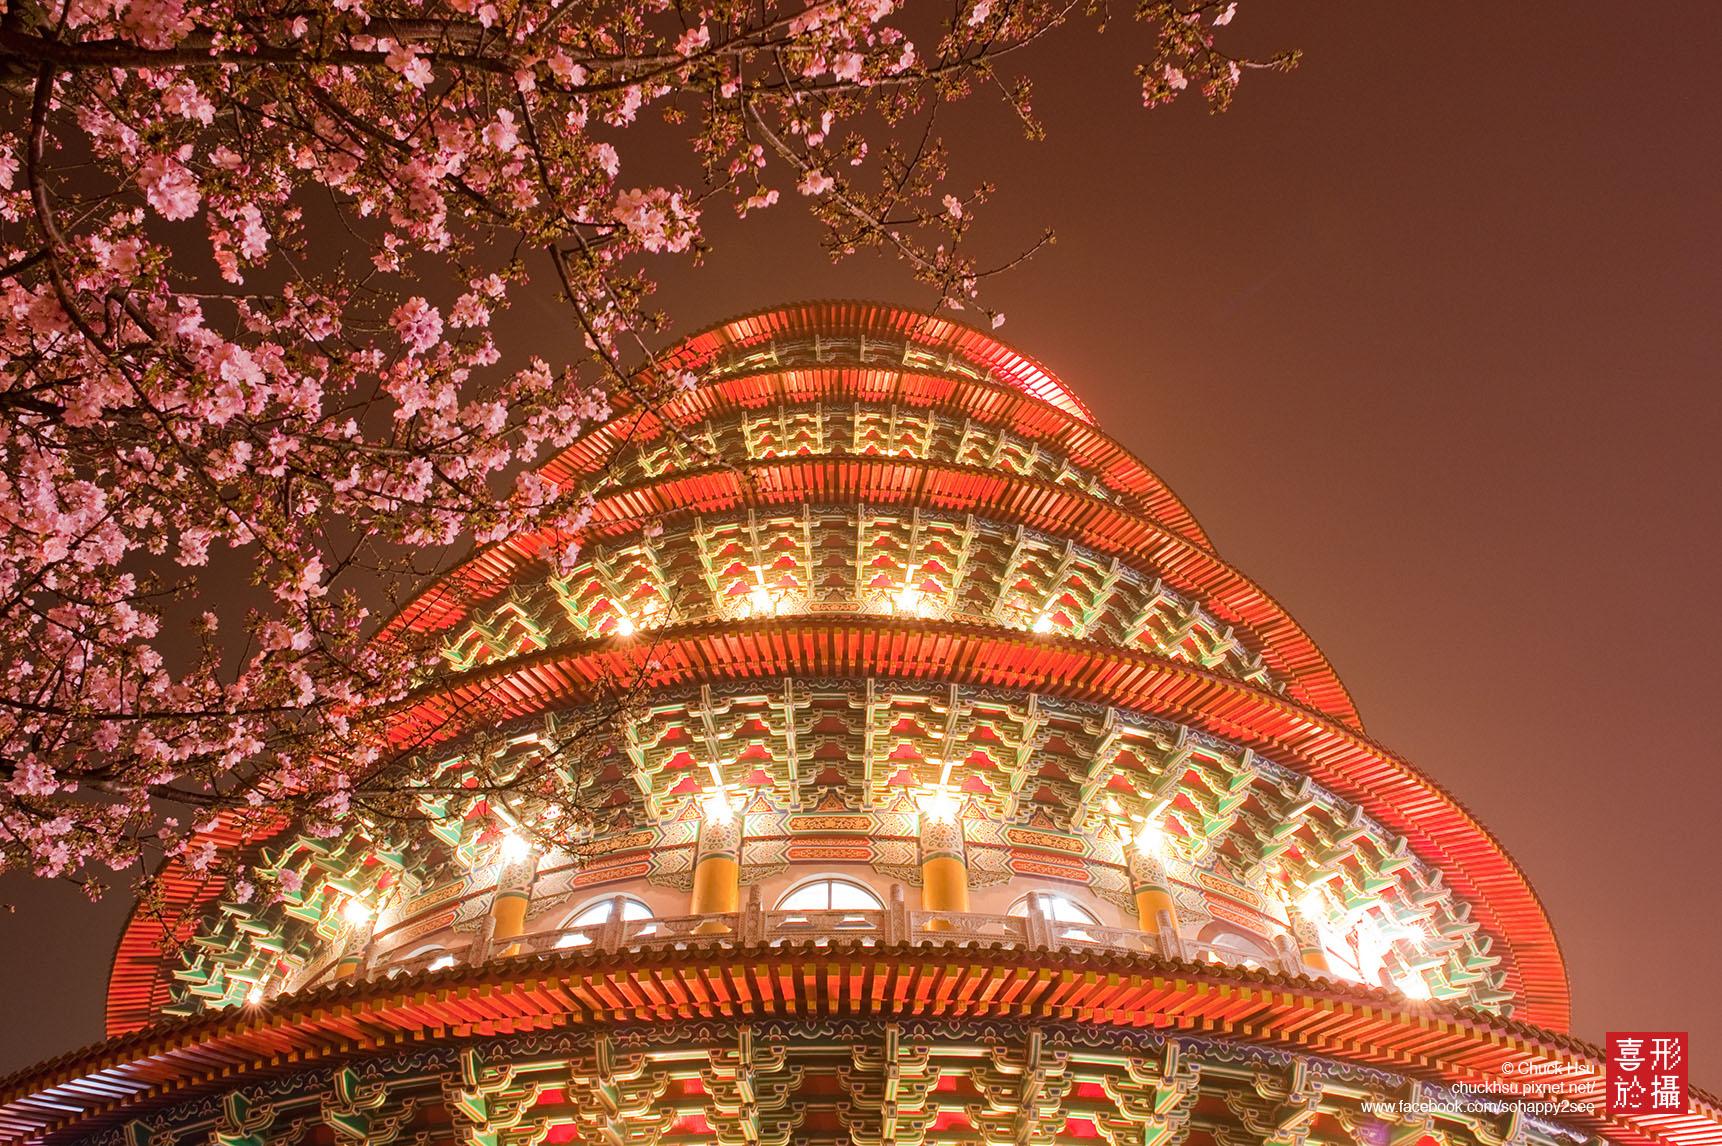 天元宮夜櫻 Sakura Taipei